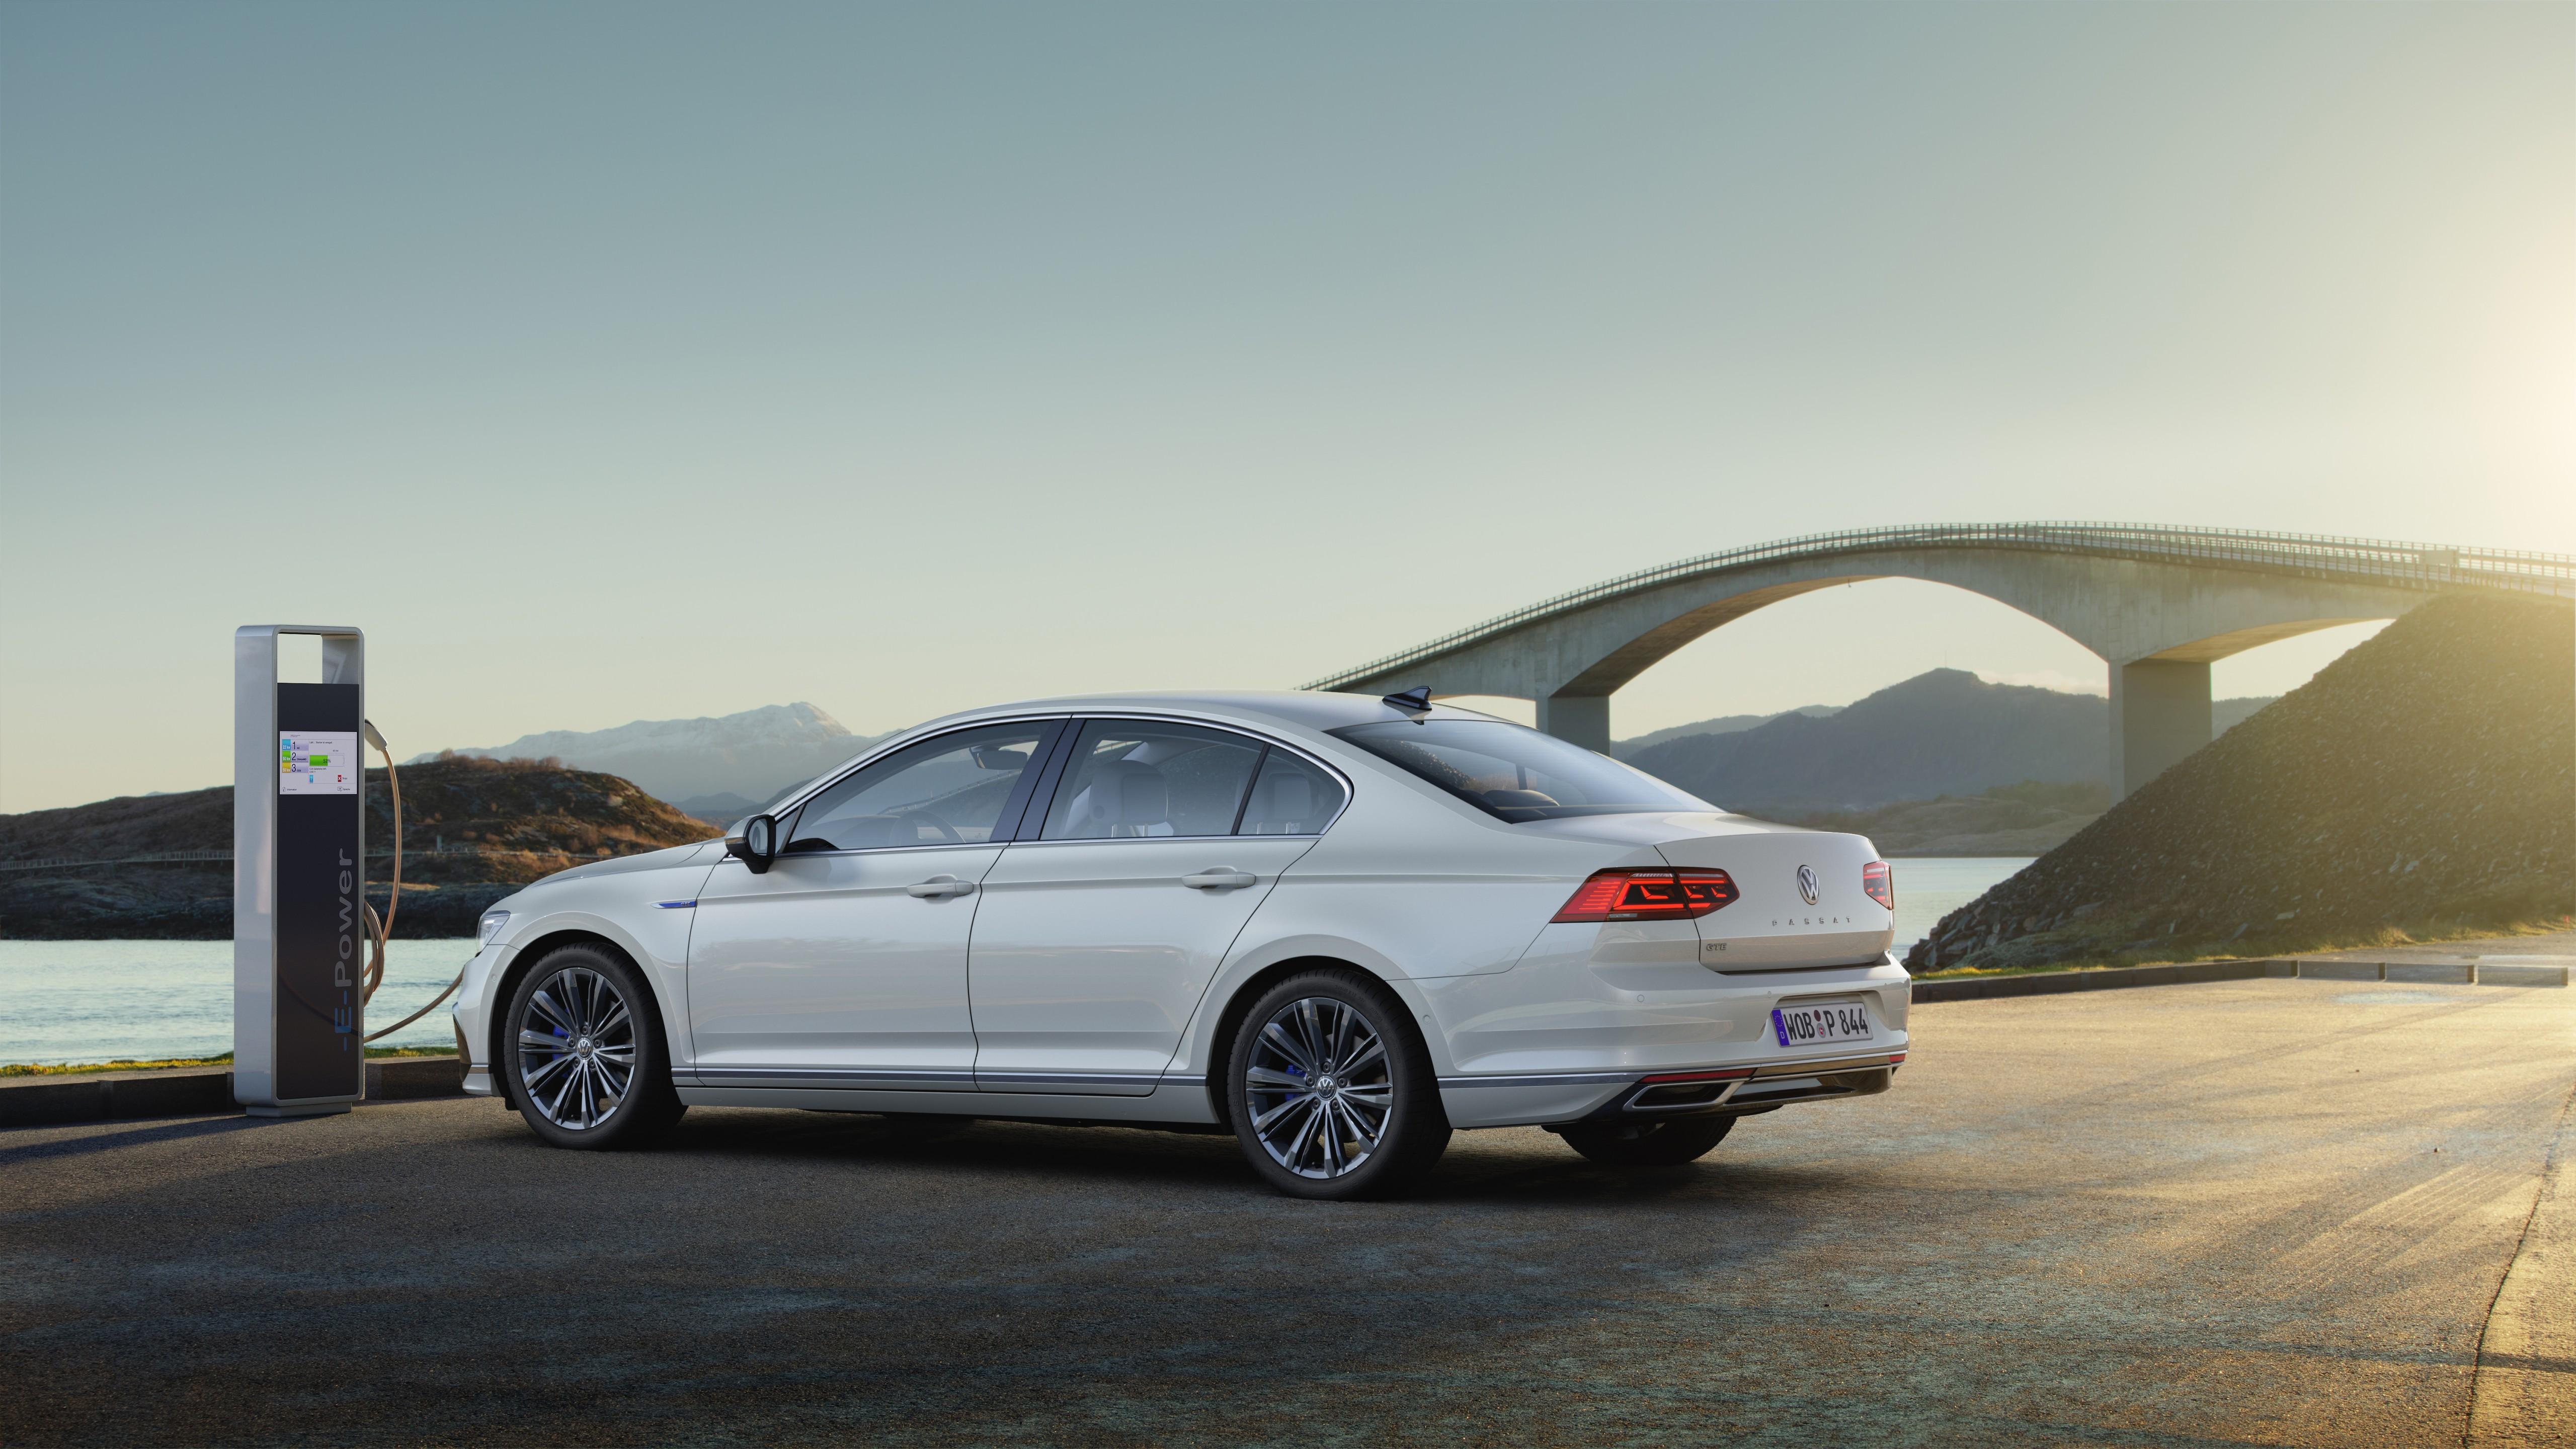 Wallpaper Volkswagen Passat GTE, 2020 Cars, 5K, Cars ...